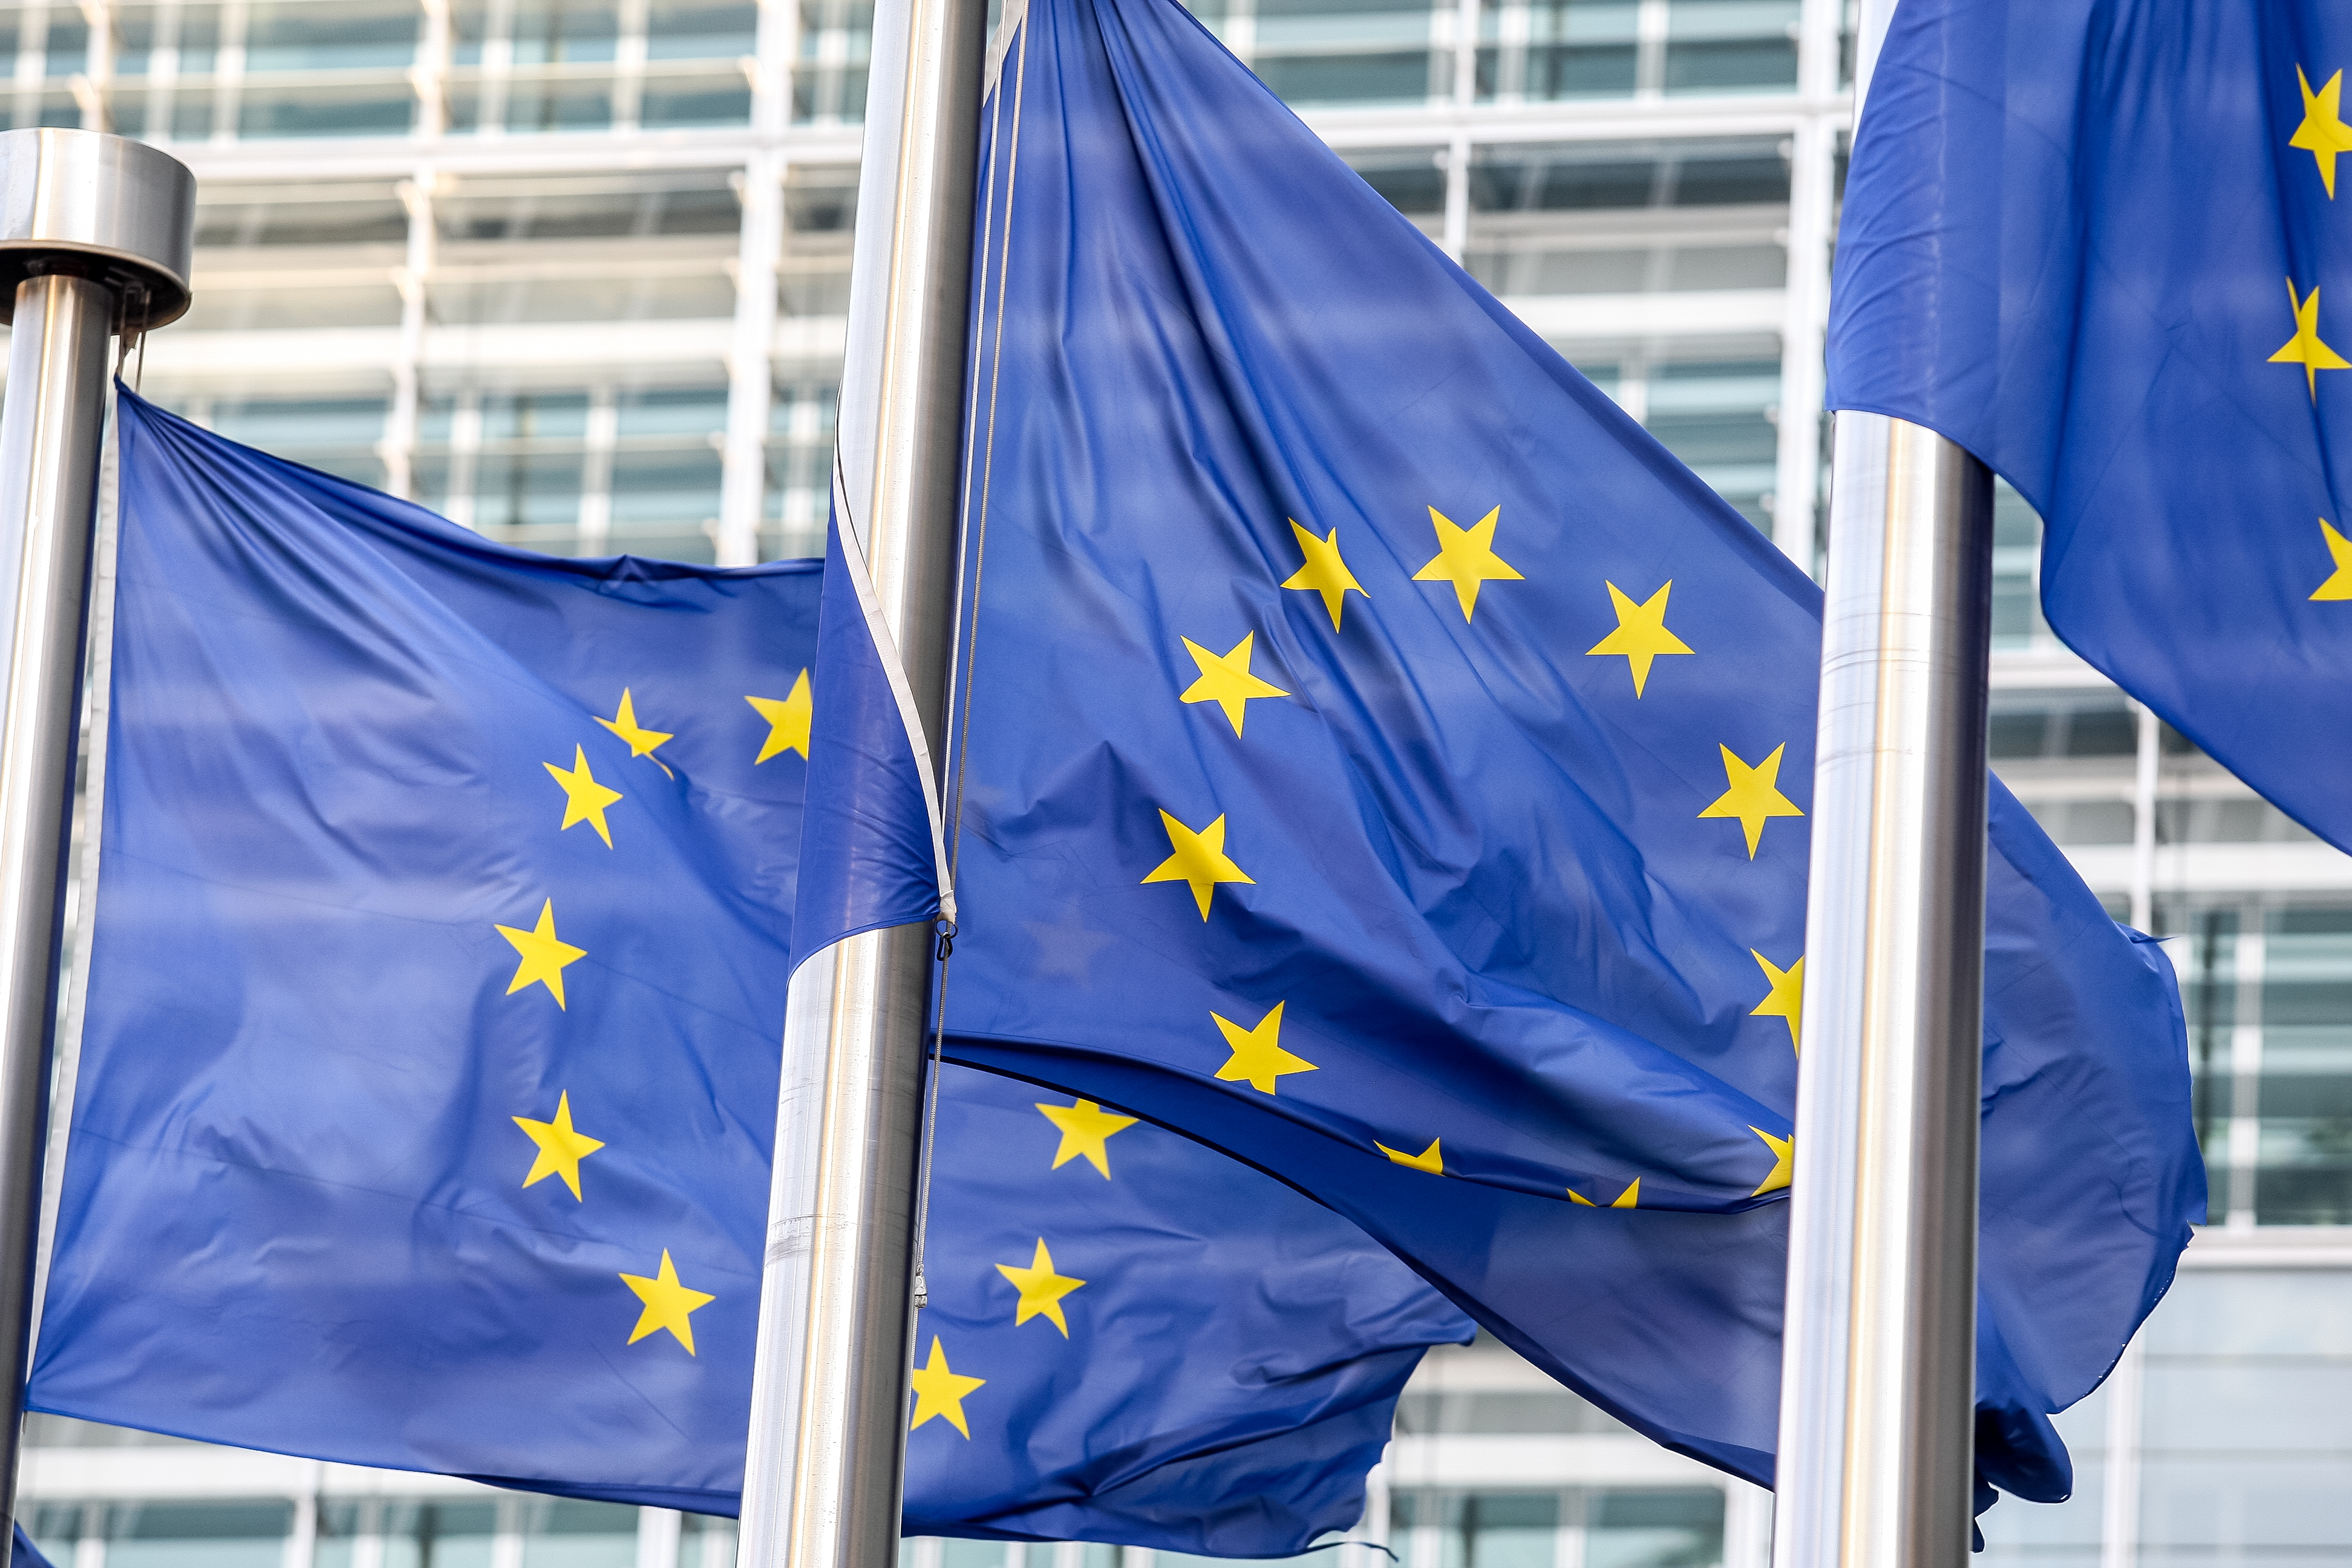 EU officials unveil draft legislation for applying FATF's 'travel rule' to crypto transactions